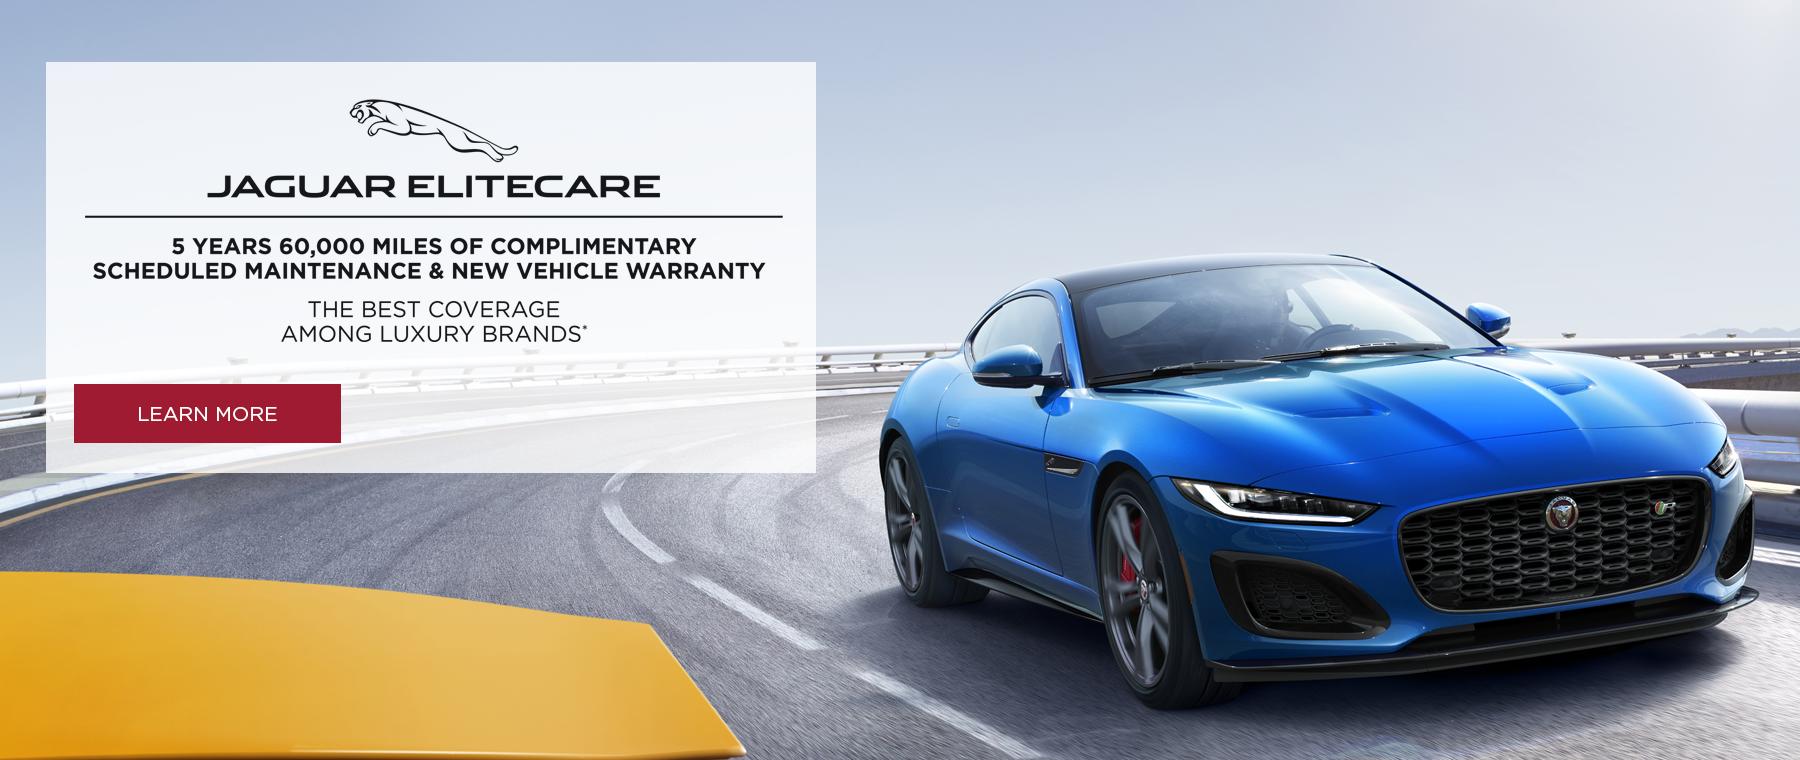 Jaguar EliteCare the best coverage among luxury brands